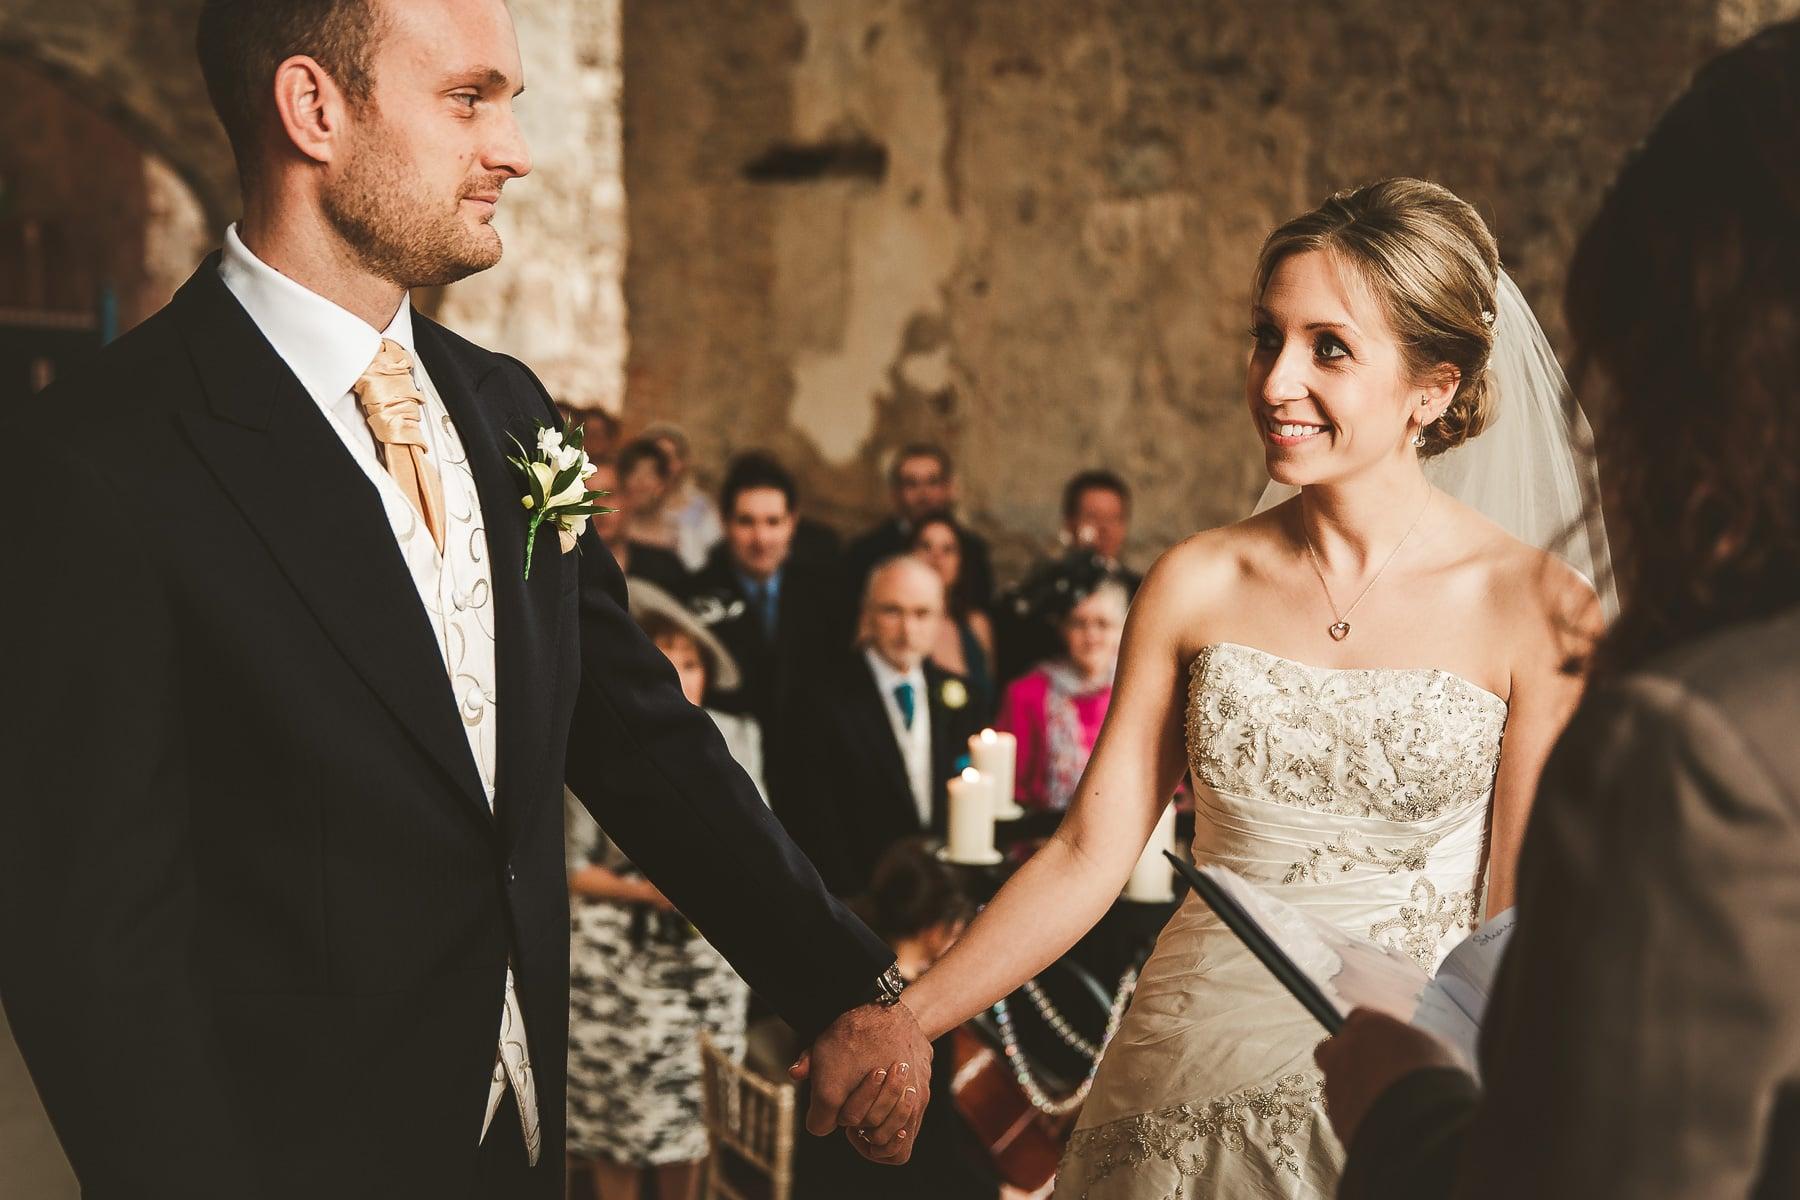 Lulworth-Castle-Dorset-intimate-wedding